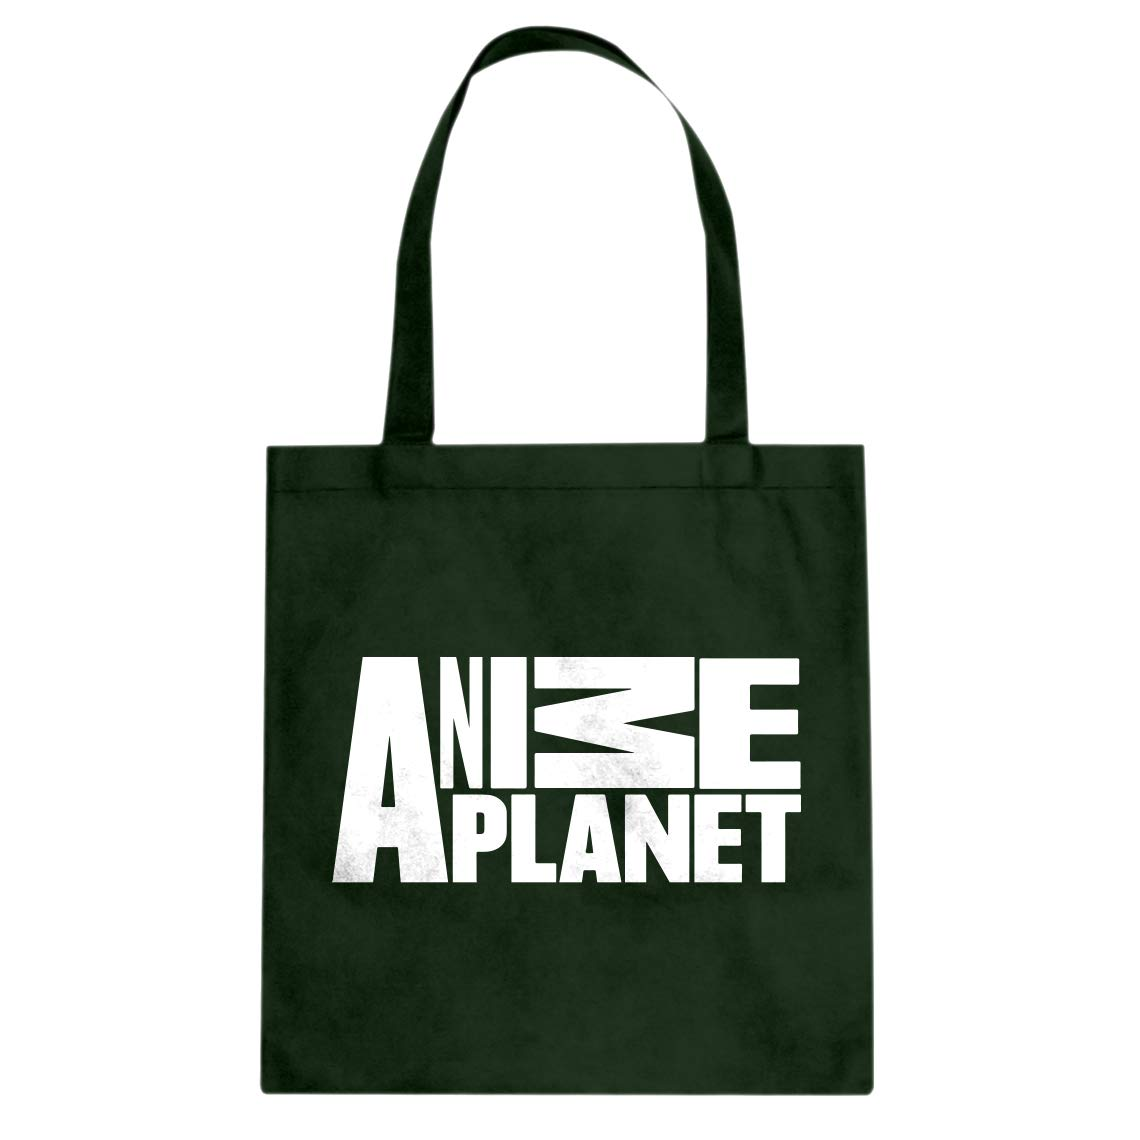 Indica Plateau Anime Planet Cotton Canvas Tote Bag